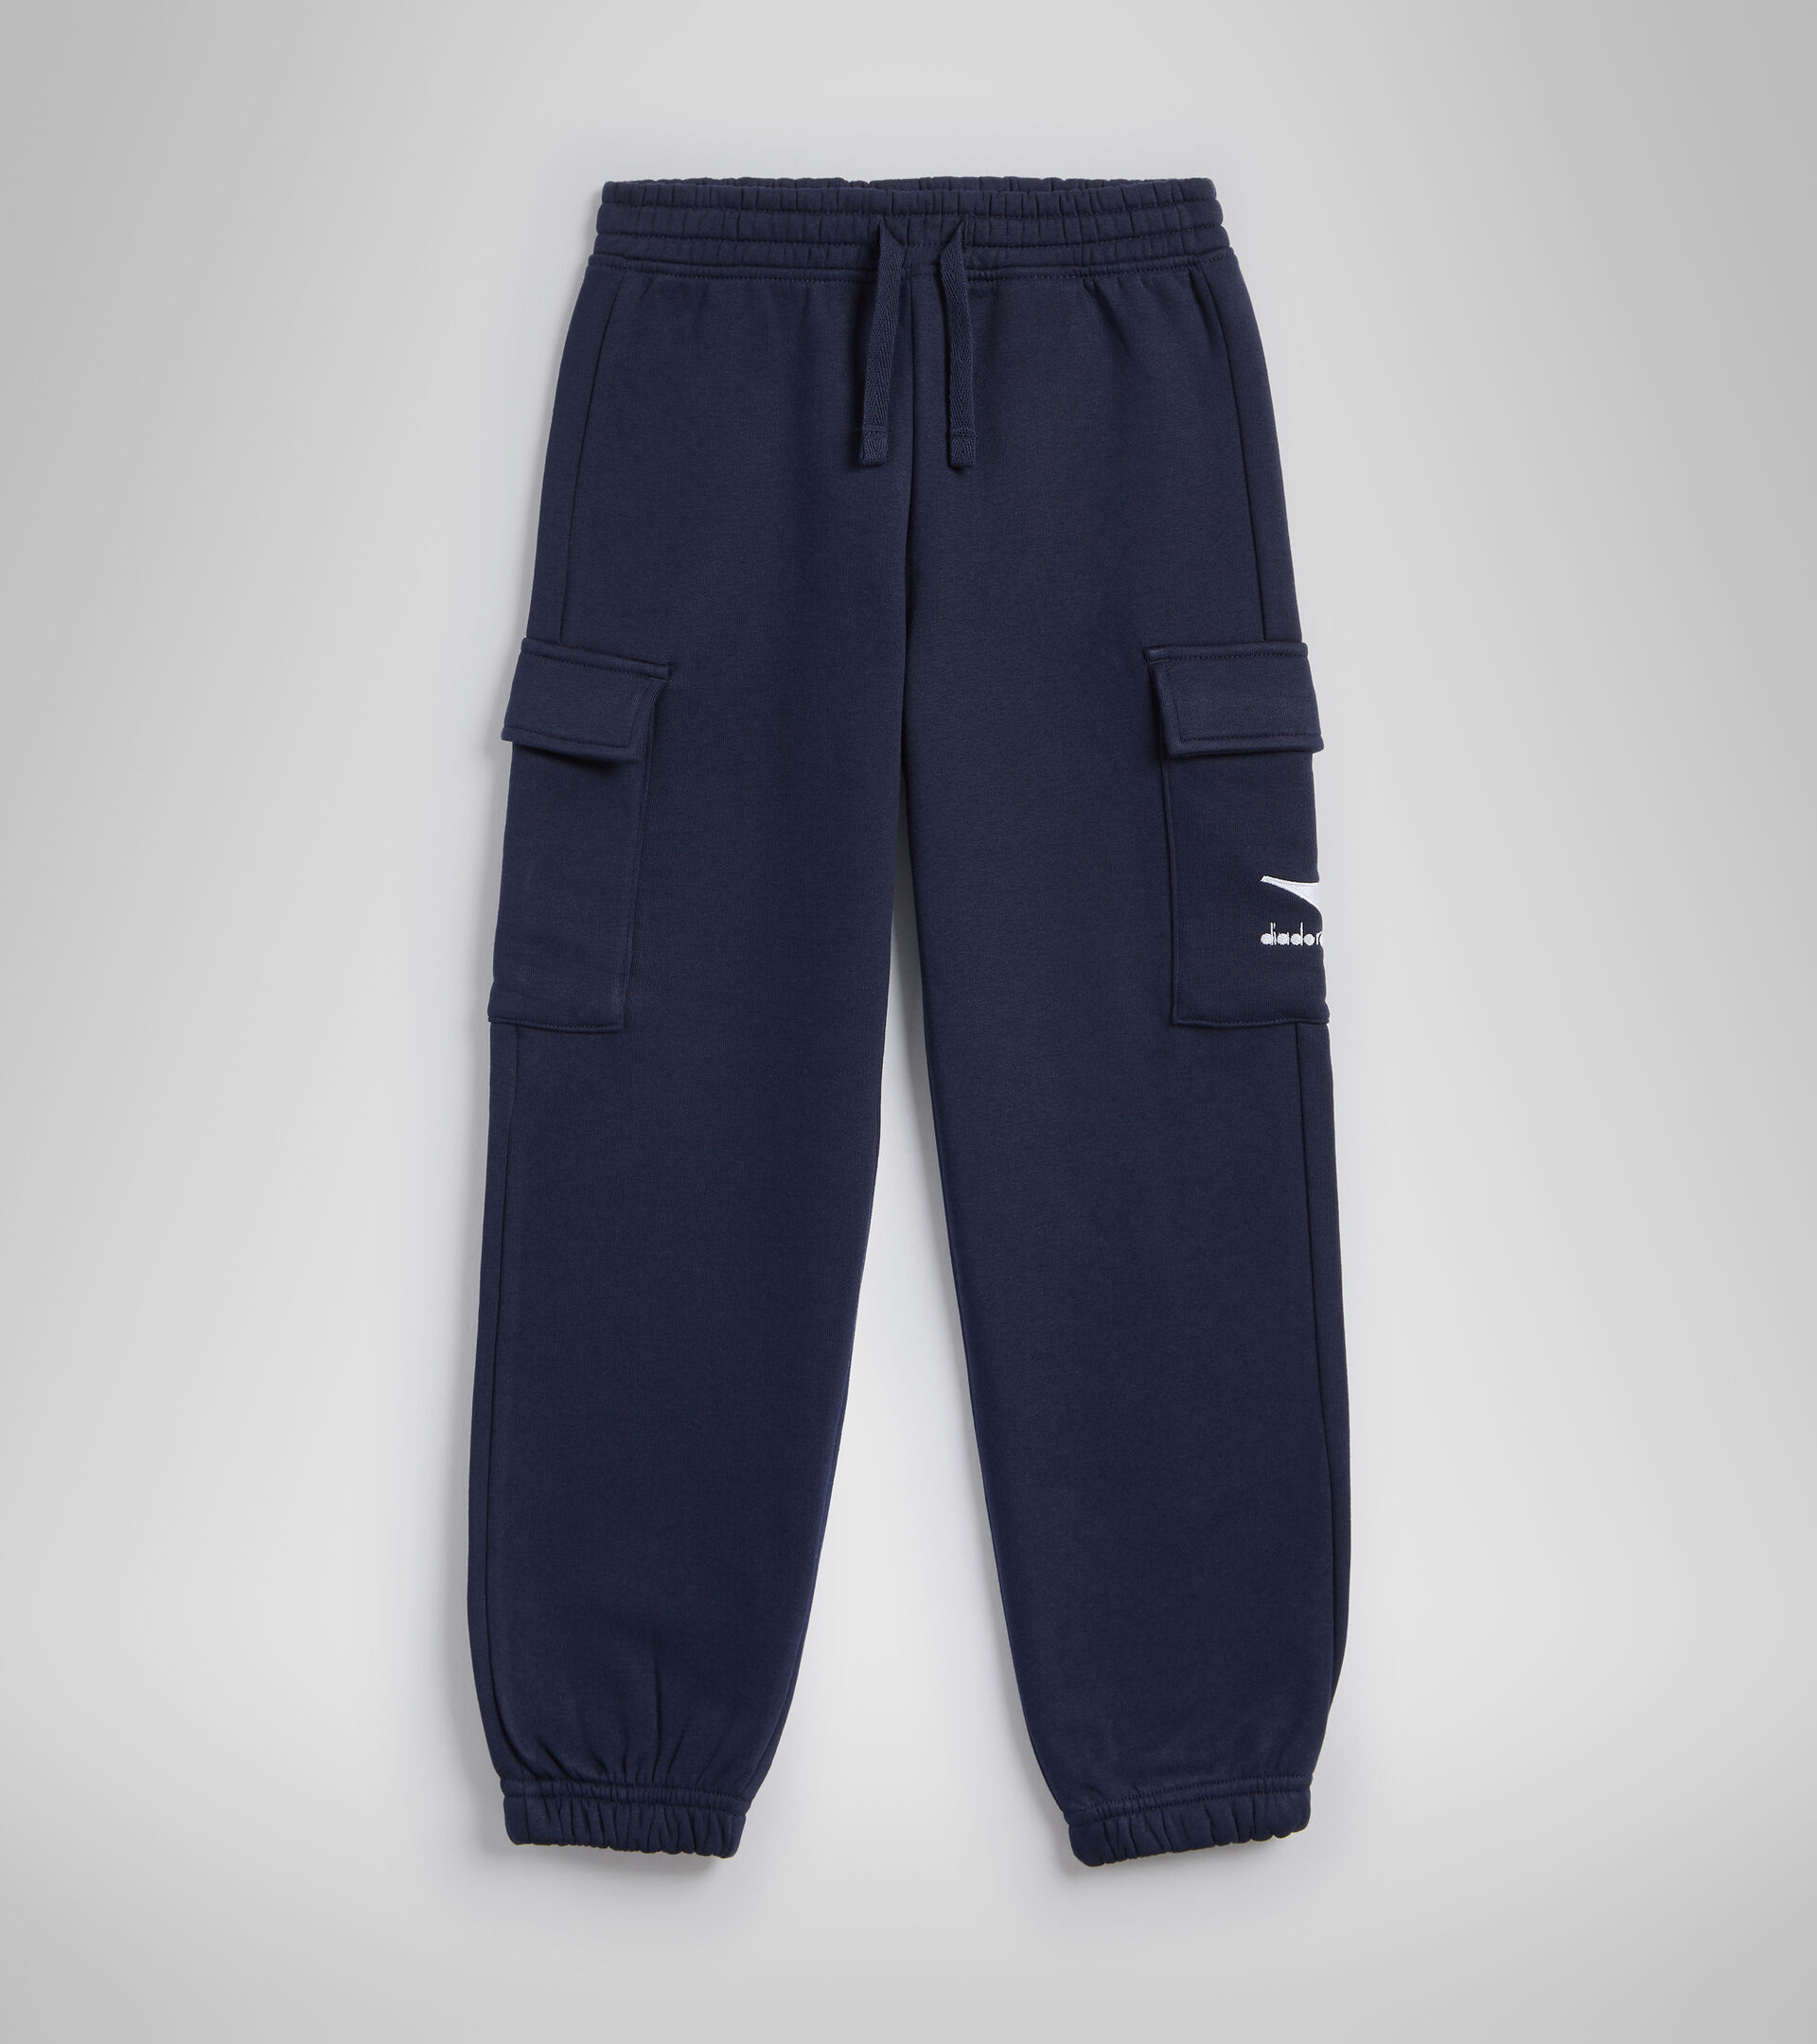 Pantalones deportivos - Niños JB.PANTS CUFF HOOPLA AZUL CHAQUETON - Diadora